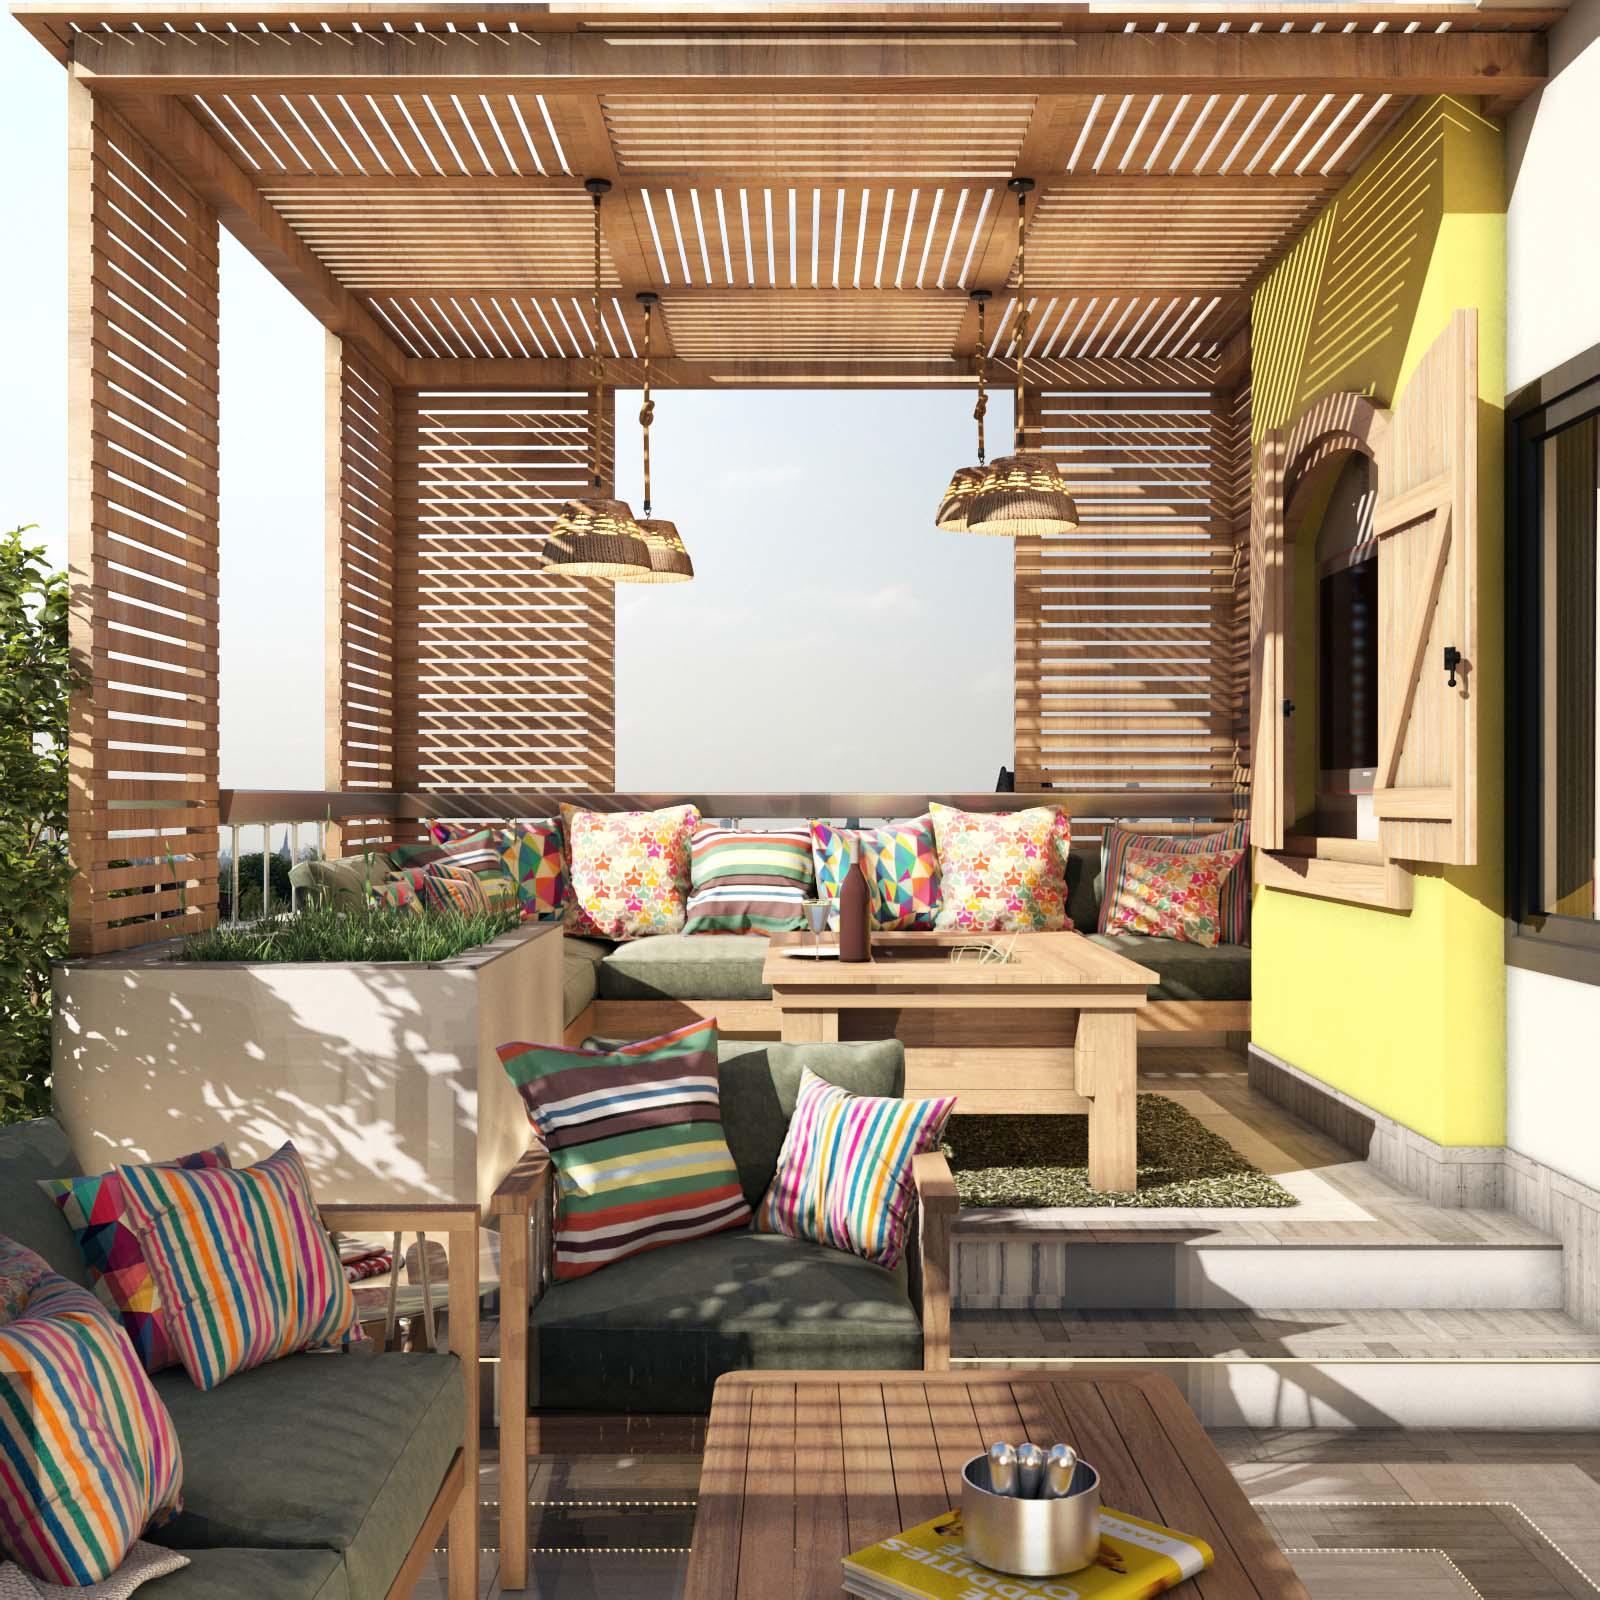 Rooftop Design, Egypt